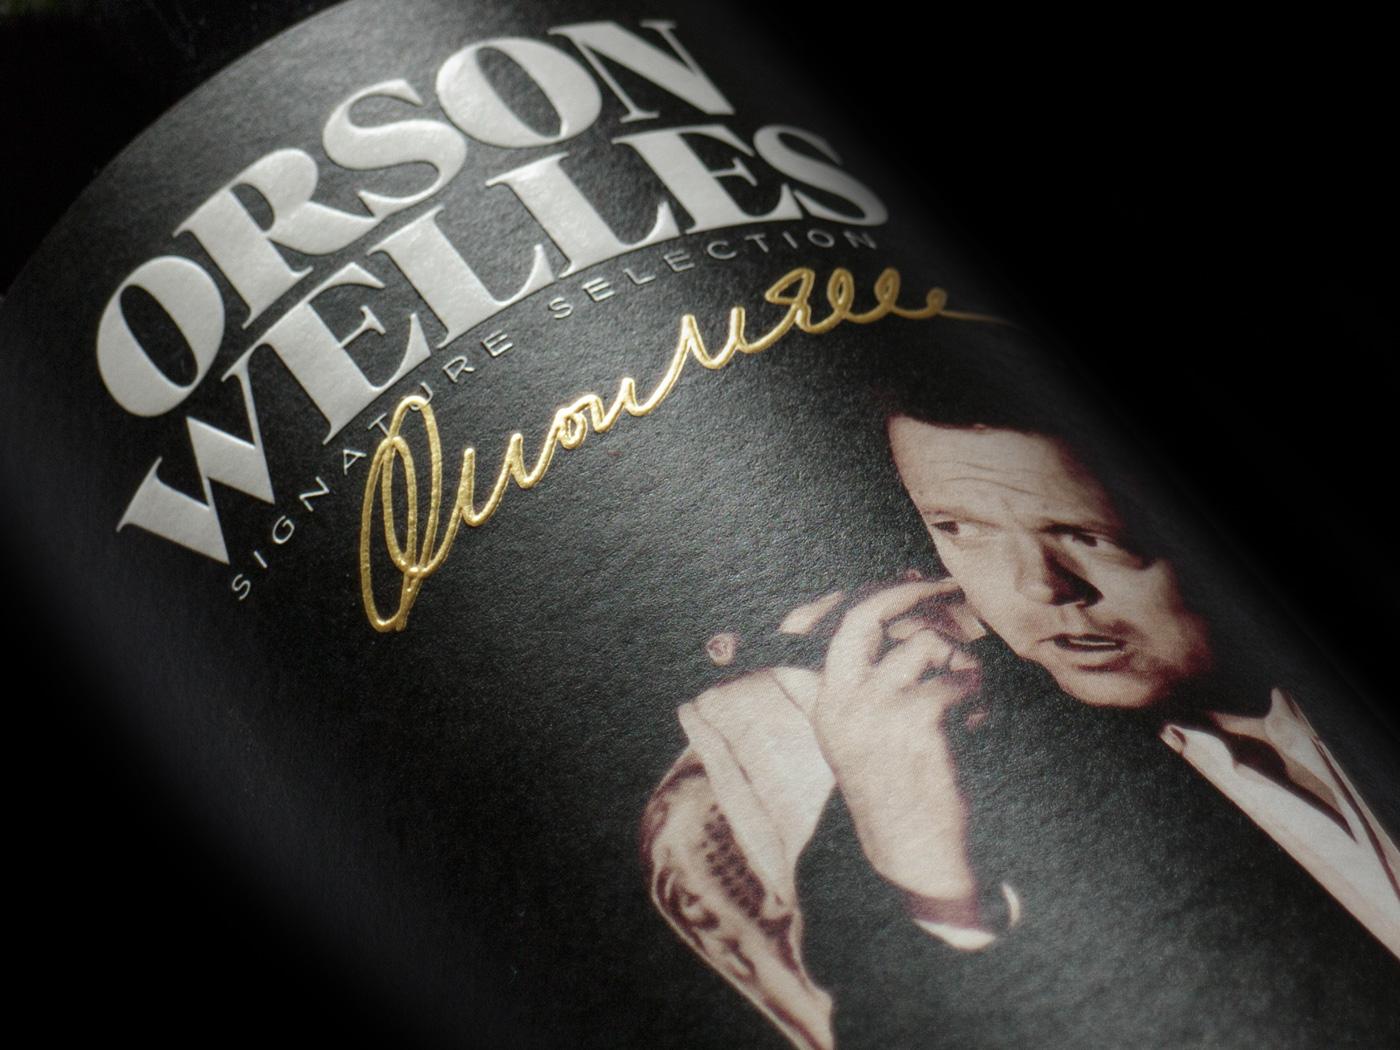 Orson Welles Signature Selection Merlot 2013 Closeup 2